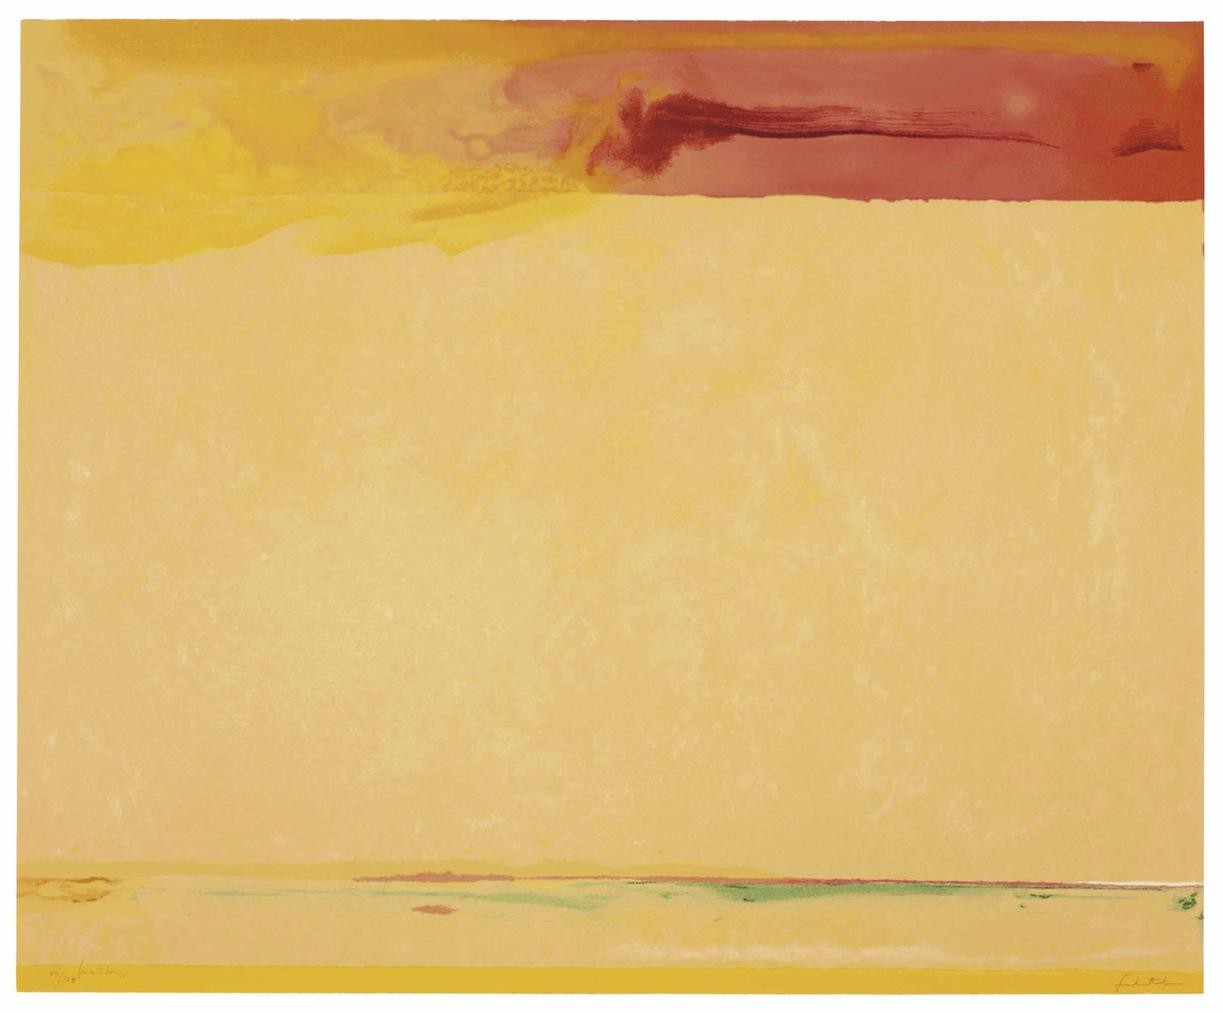 Helen Frankenthaler-Southern Exposure-2005